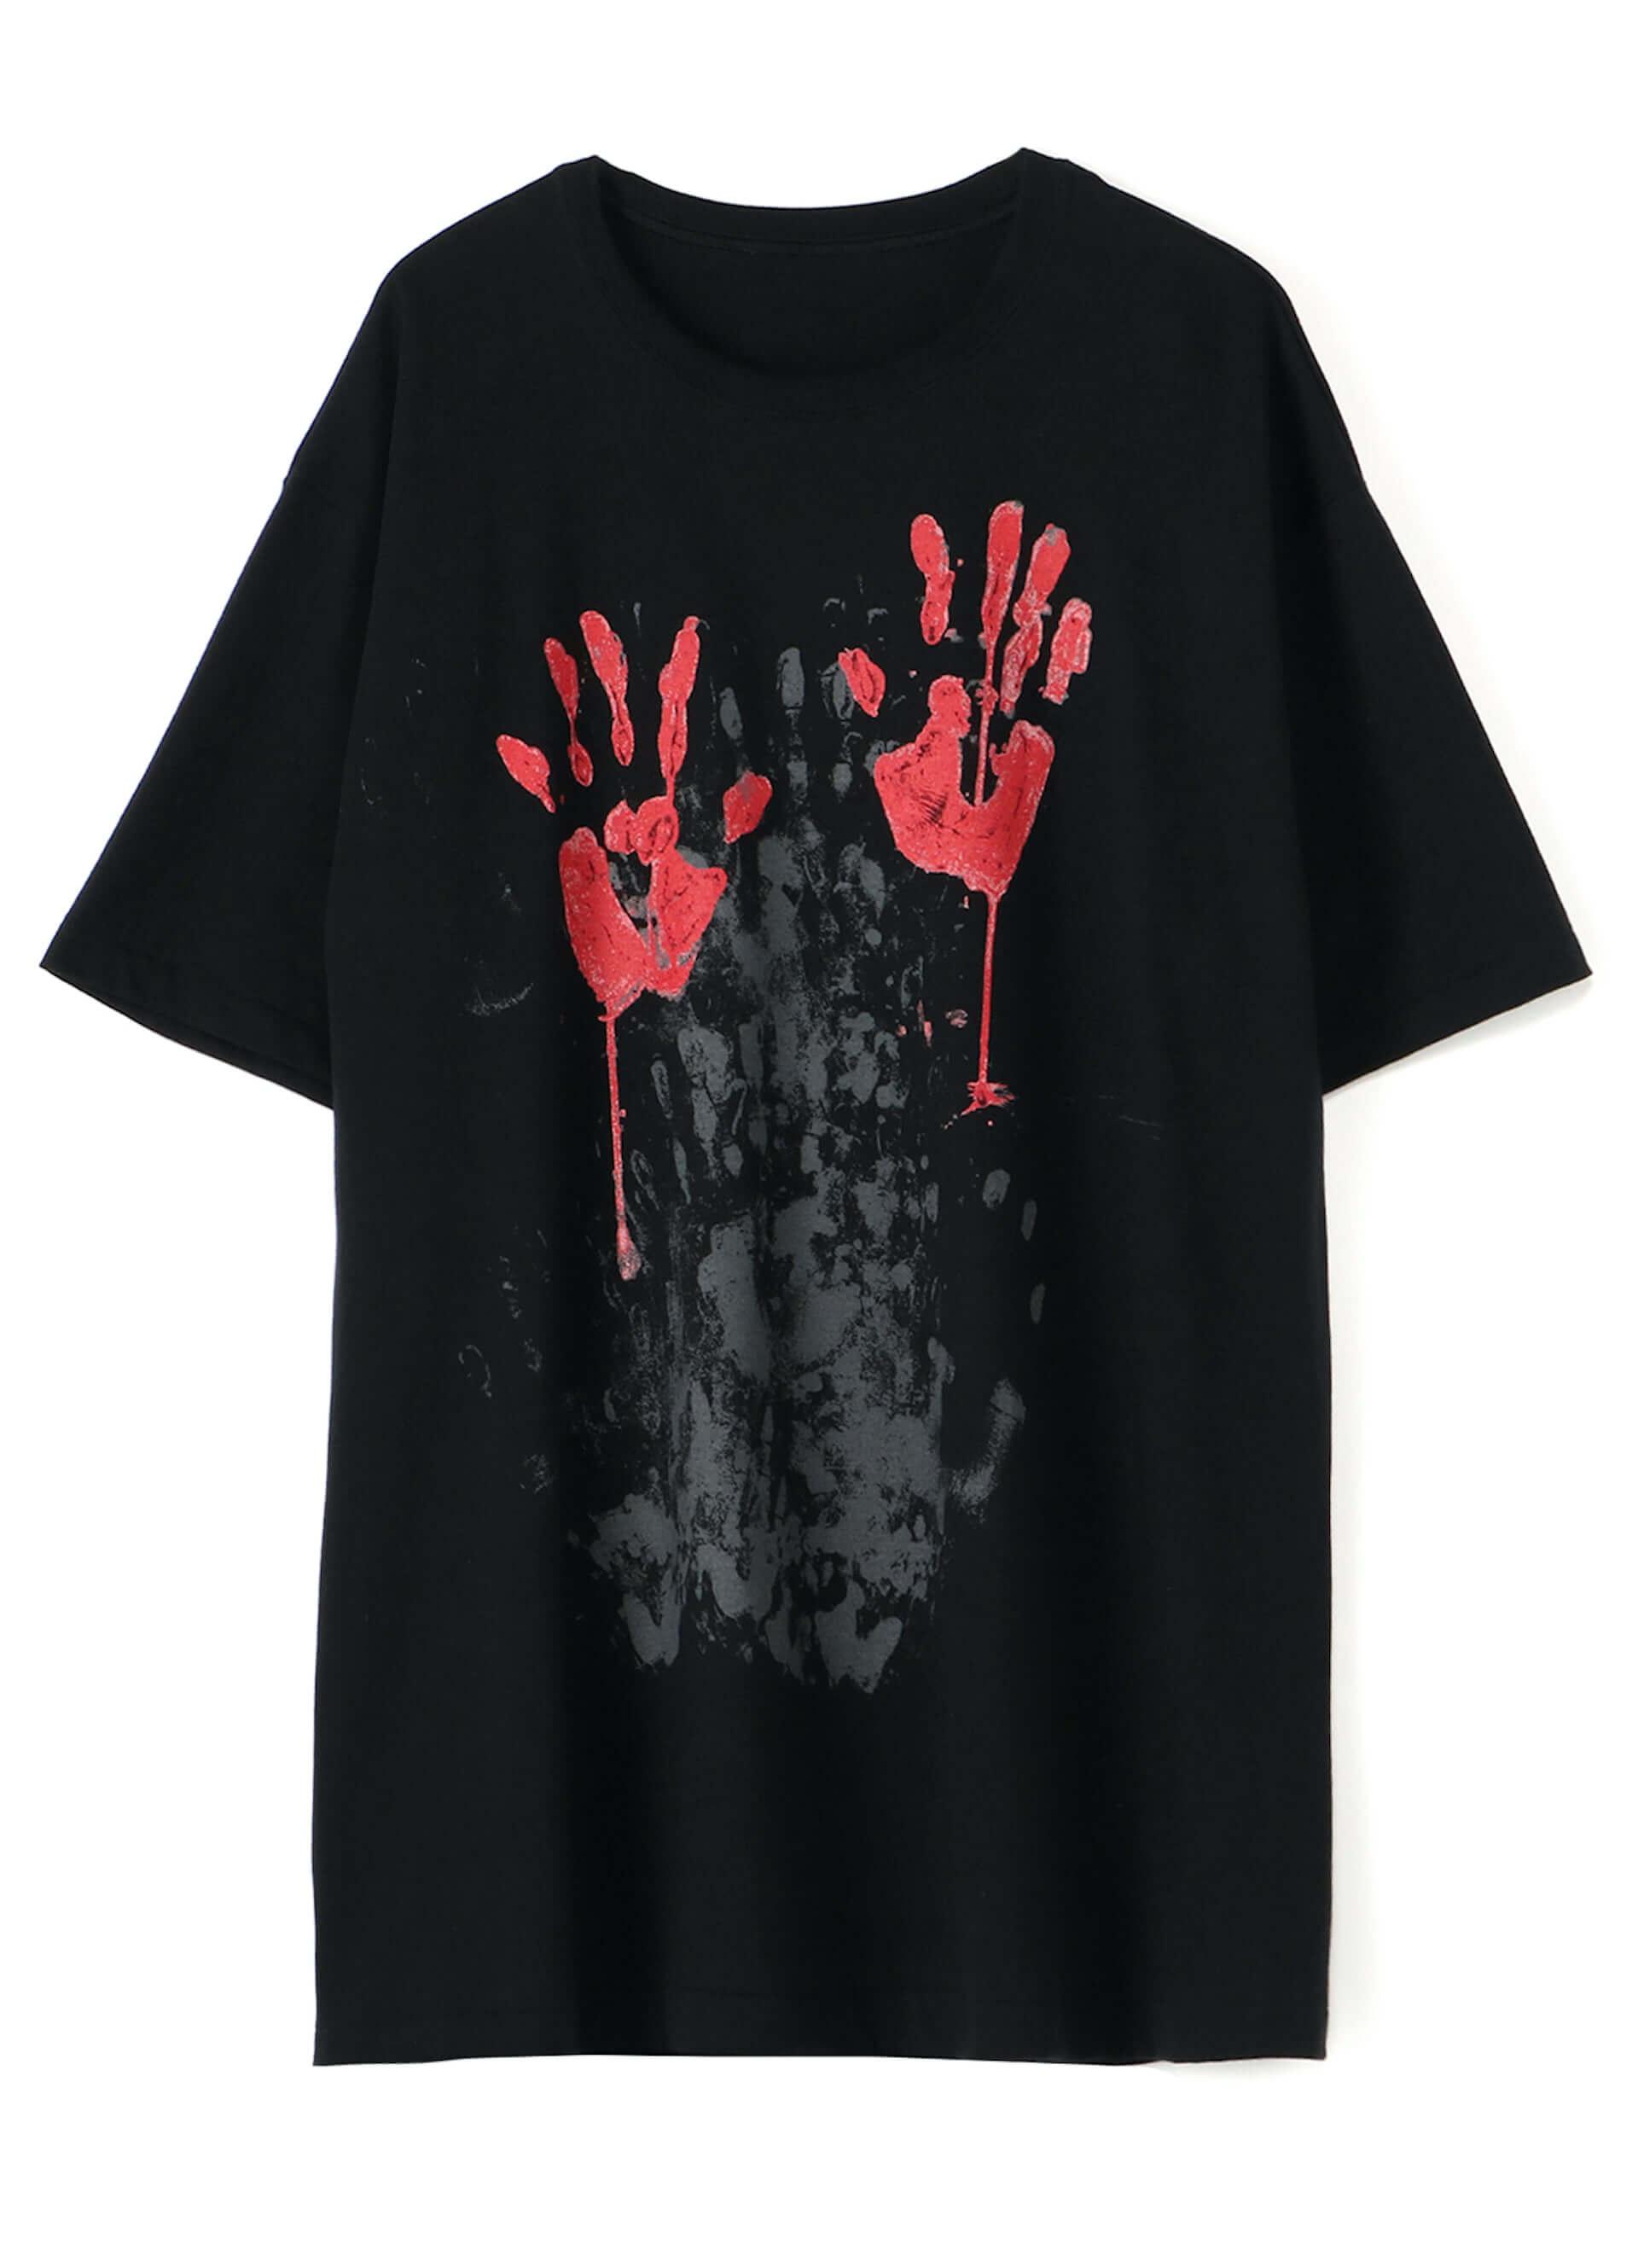 YOHJI YAMAMOTO +NOIRと画家 内田すずめがコラボした「Tシャツ+マスク」が限定販売!鳩や手の平のモチーフ3型 lf200604_yohjiyamamoto_06-1920x2658